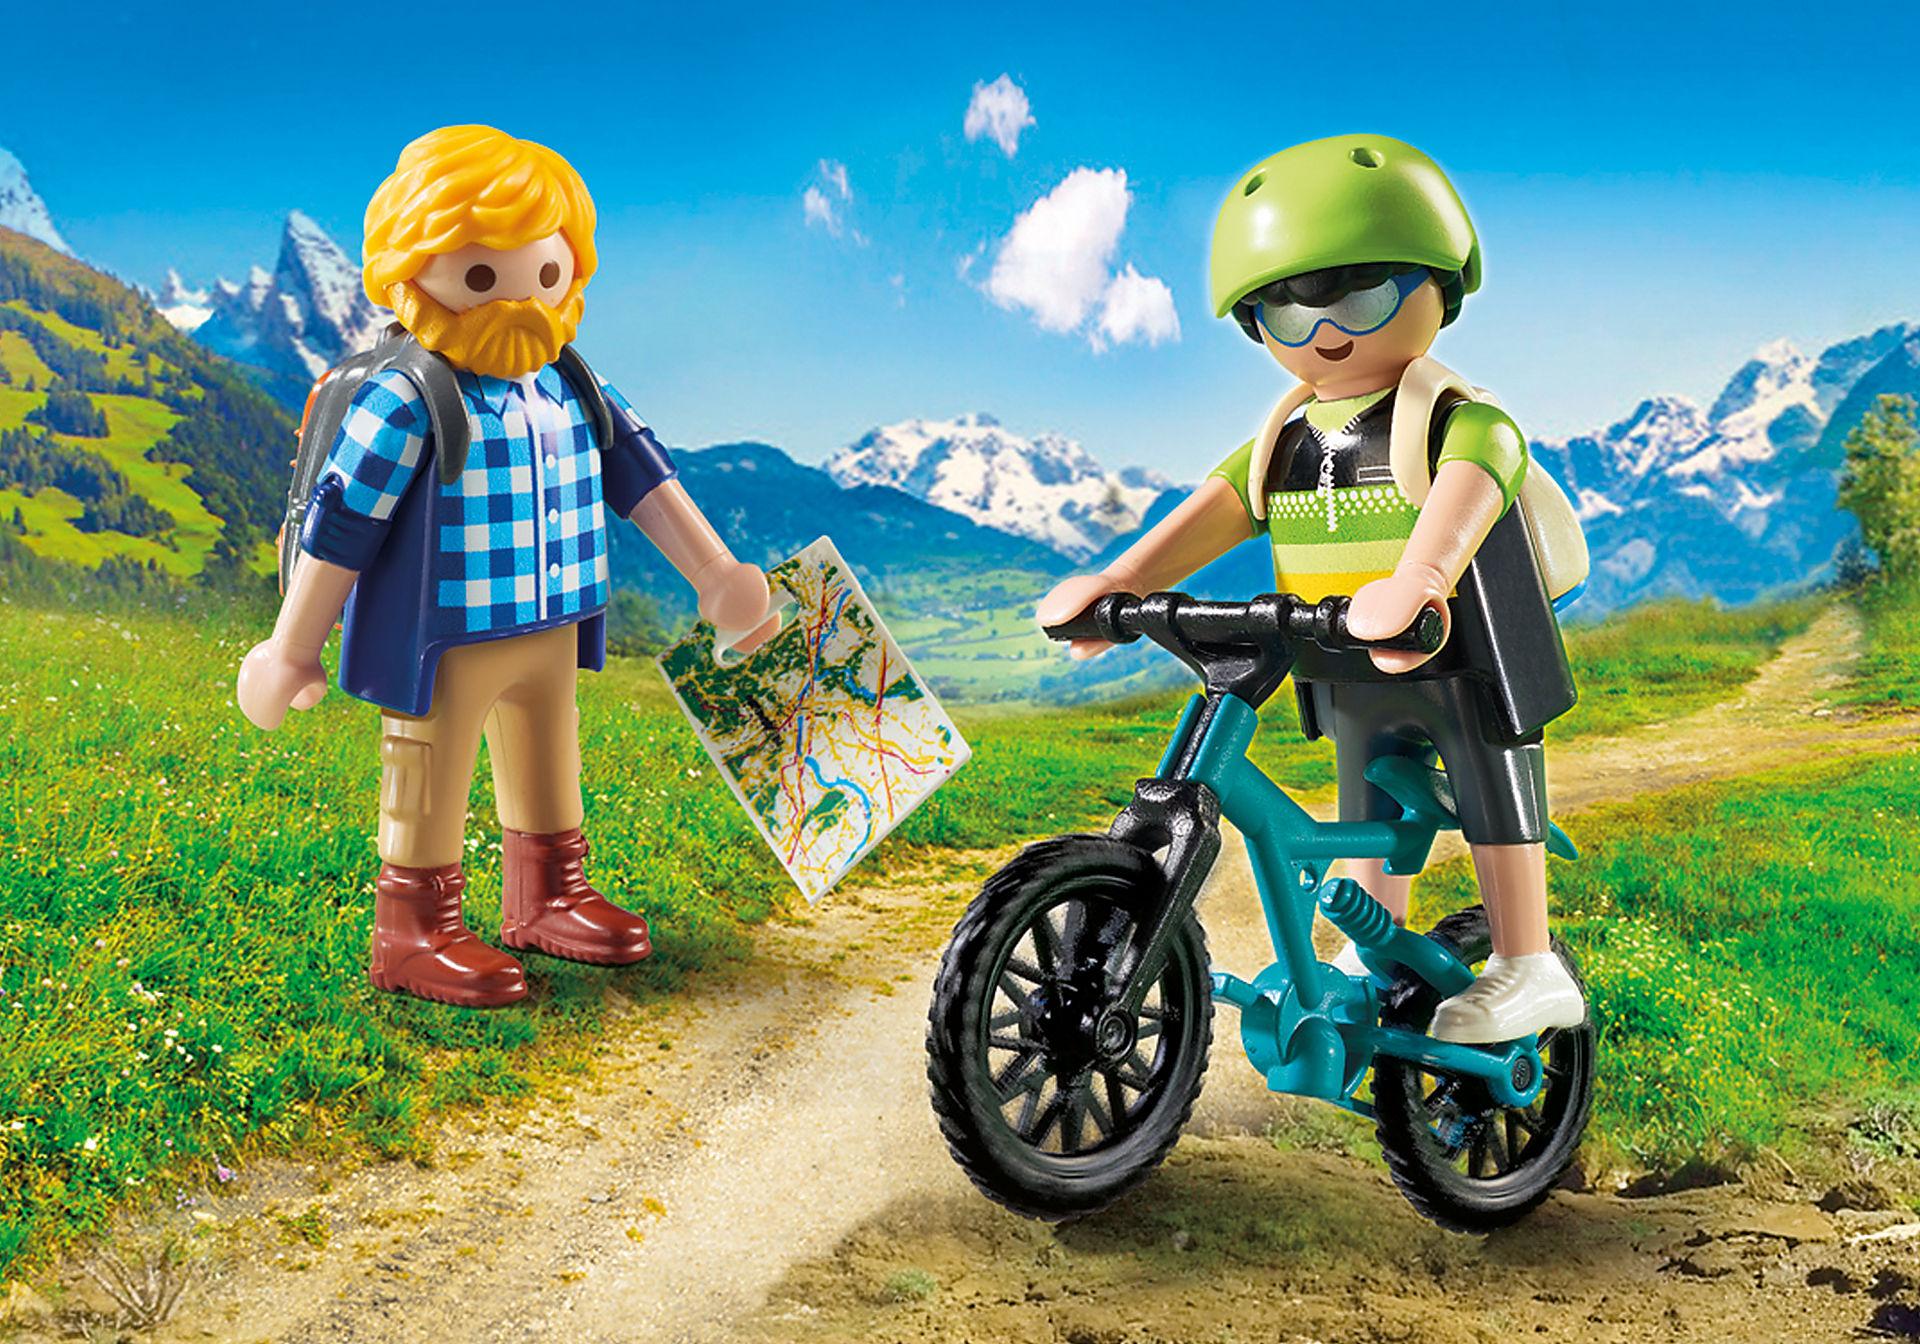 http://media.playmobil.com/i/playmobil/9129_product_detail/Biker and Hiker